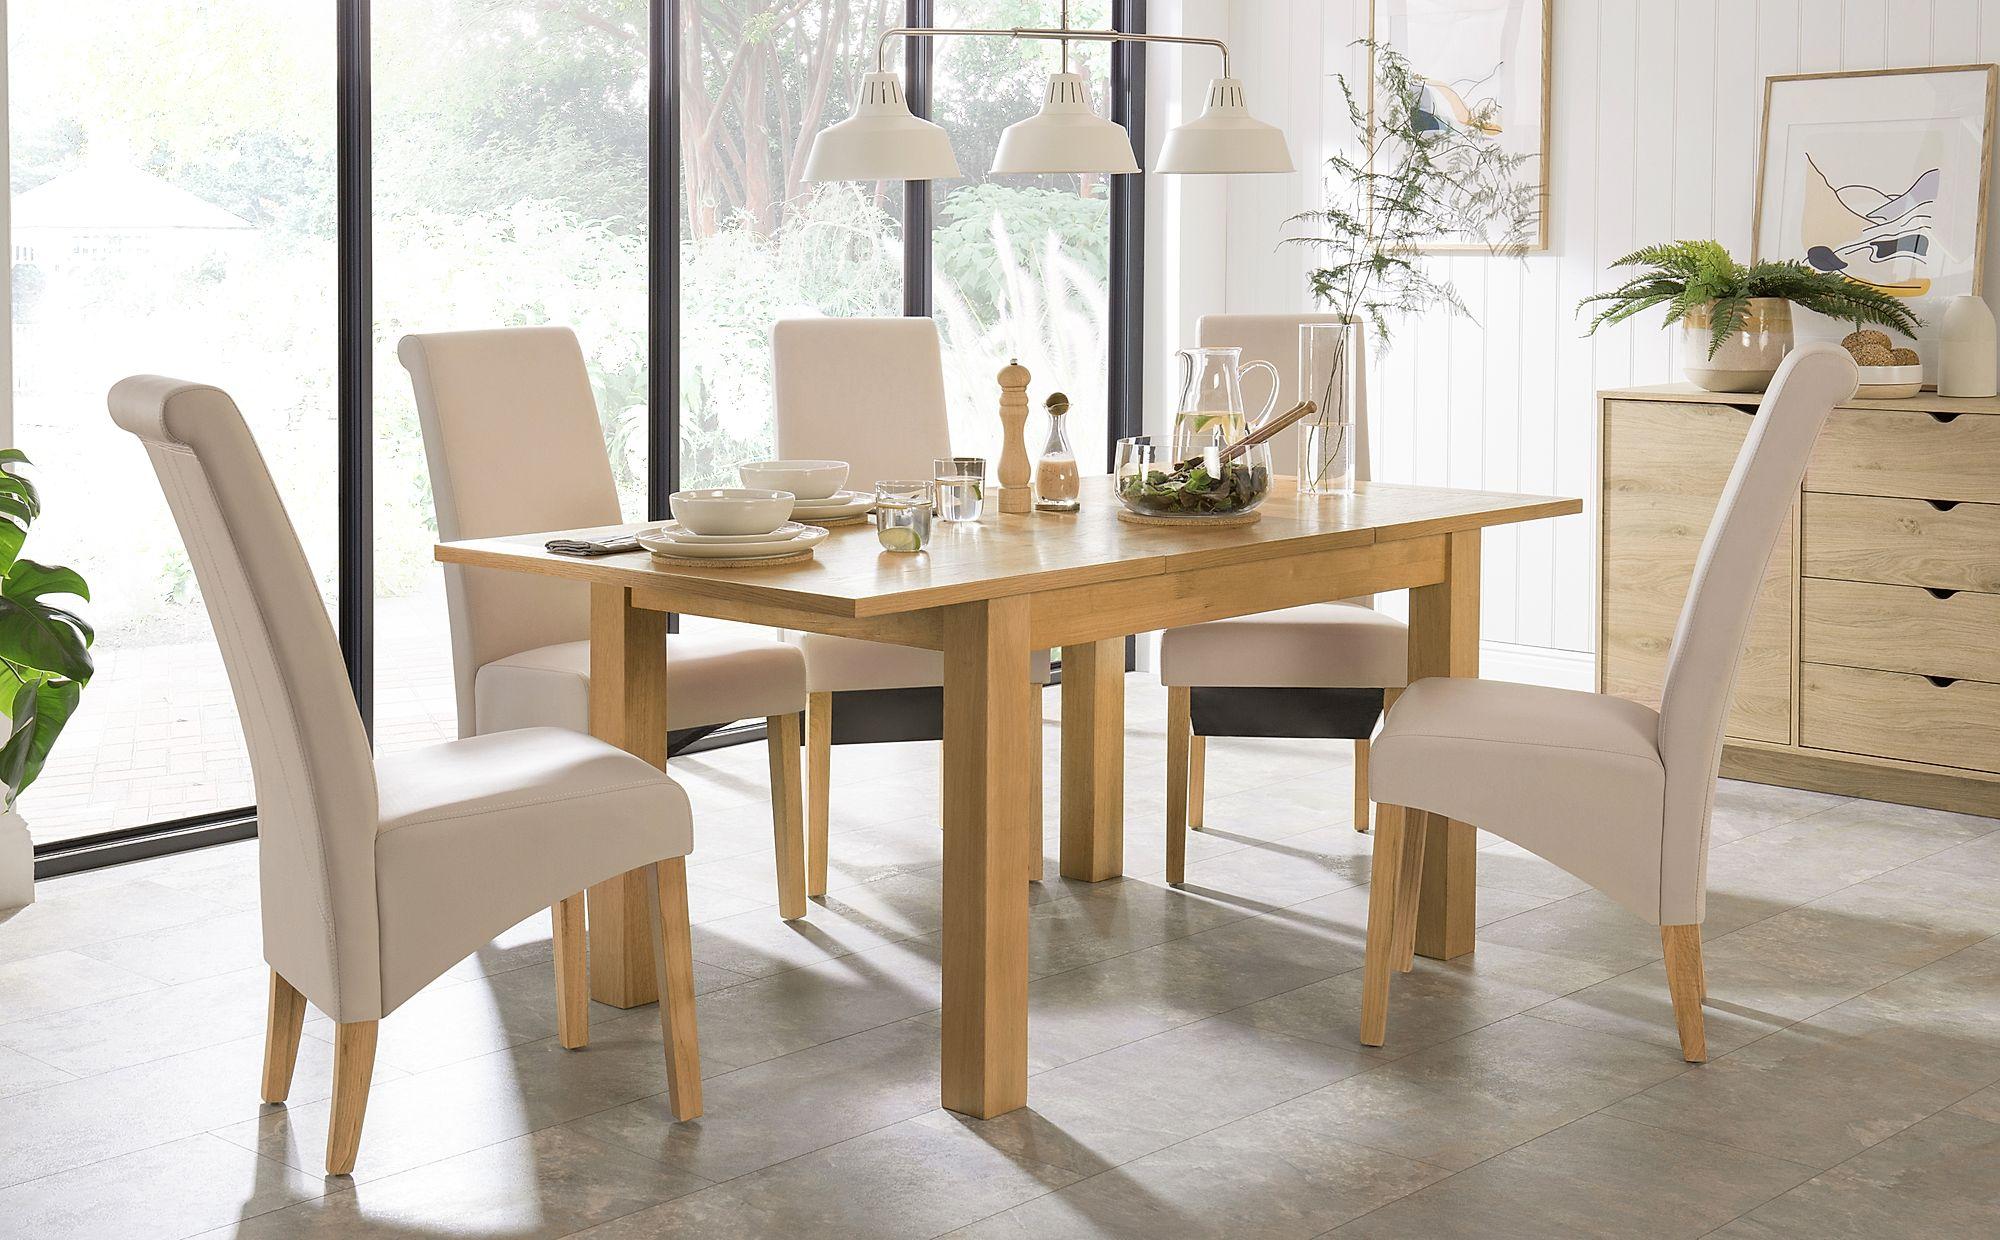 Hamilton 120 170cm Oak Extending Dining Table With 4